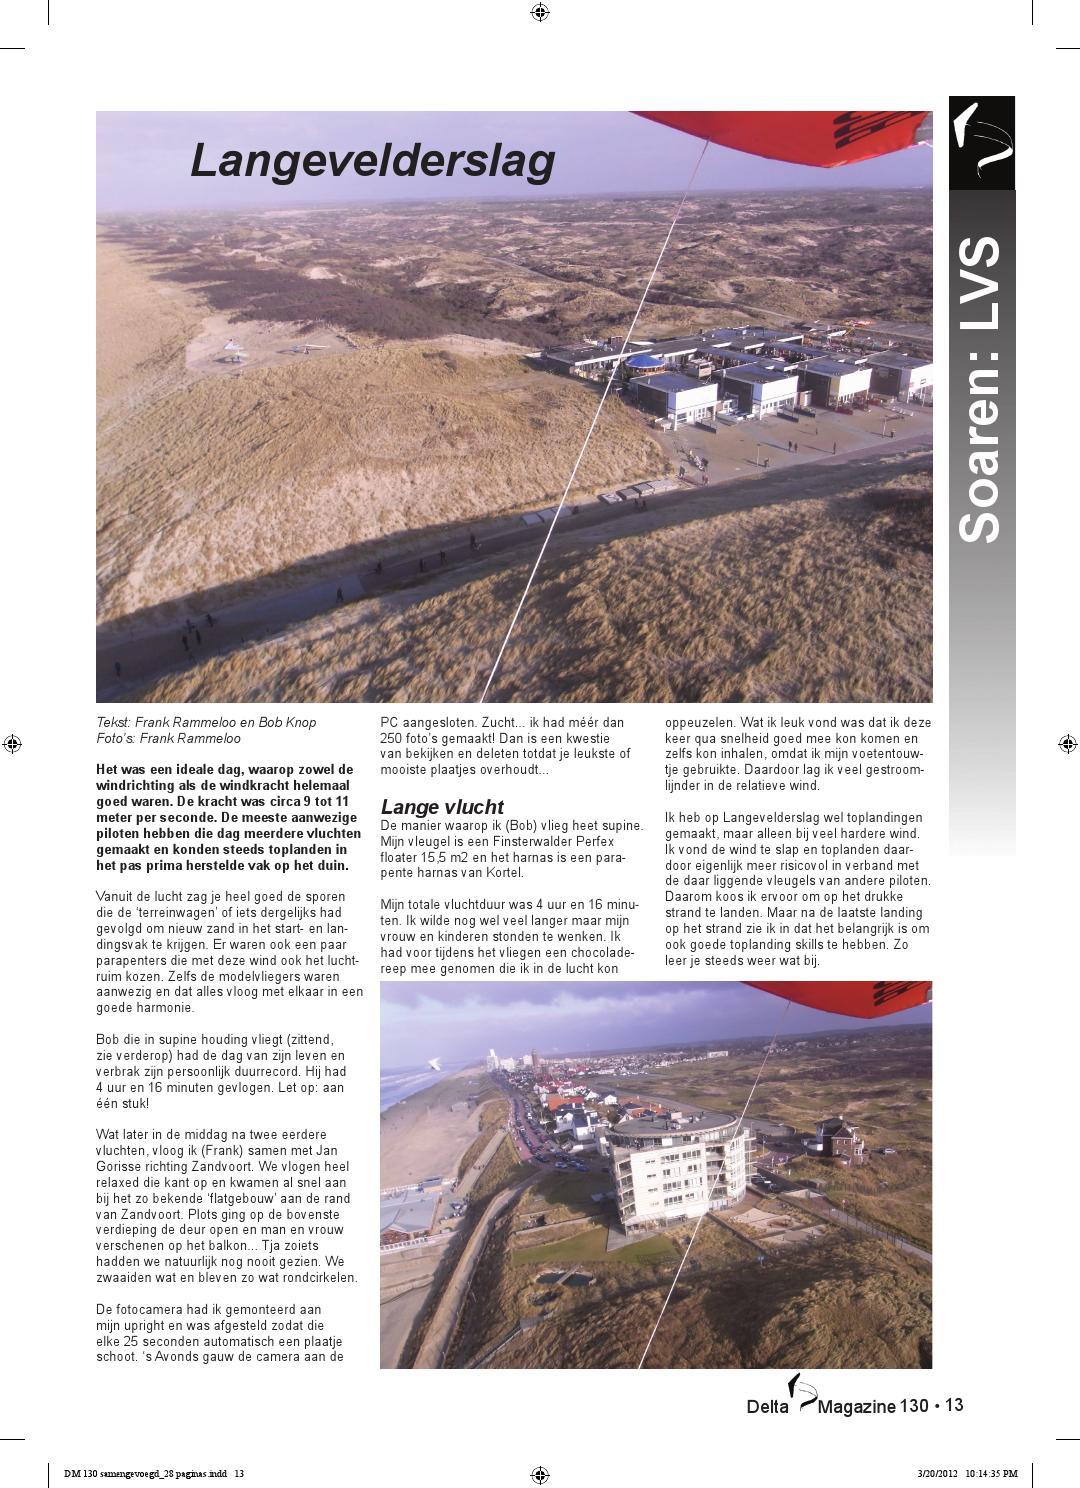 Delta Magazine (2012) 130 by Koninklijke Nederlandse